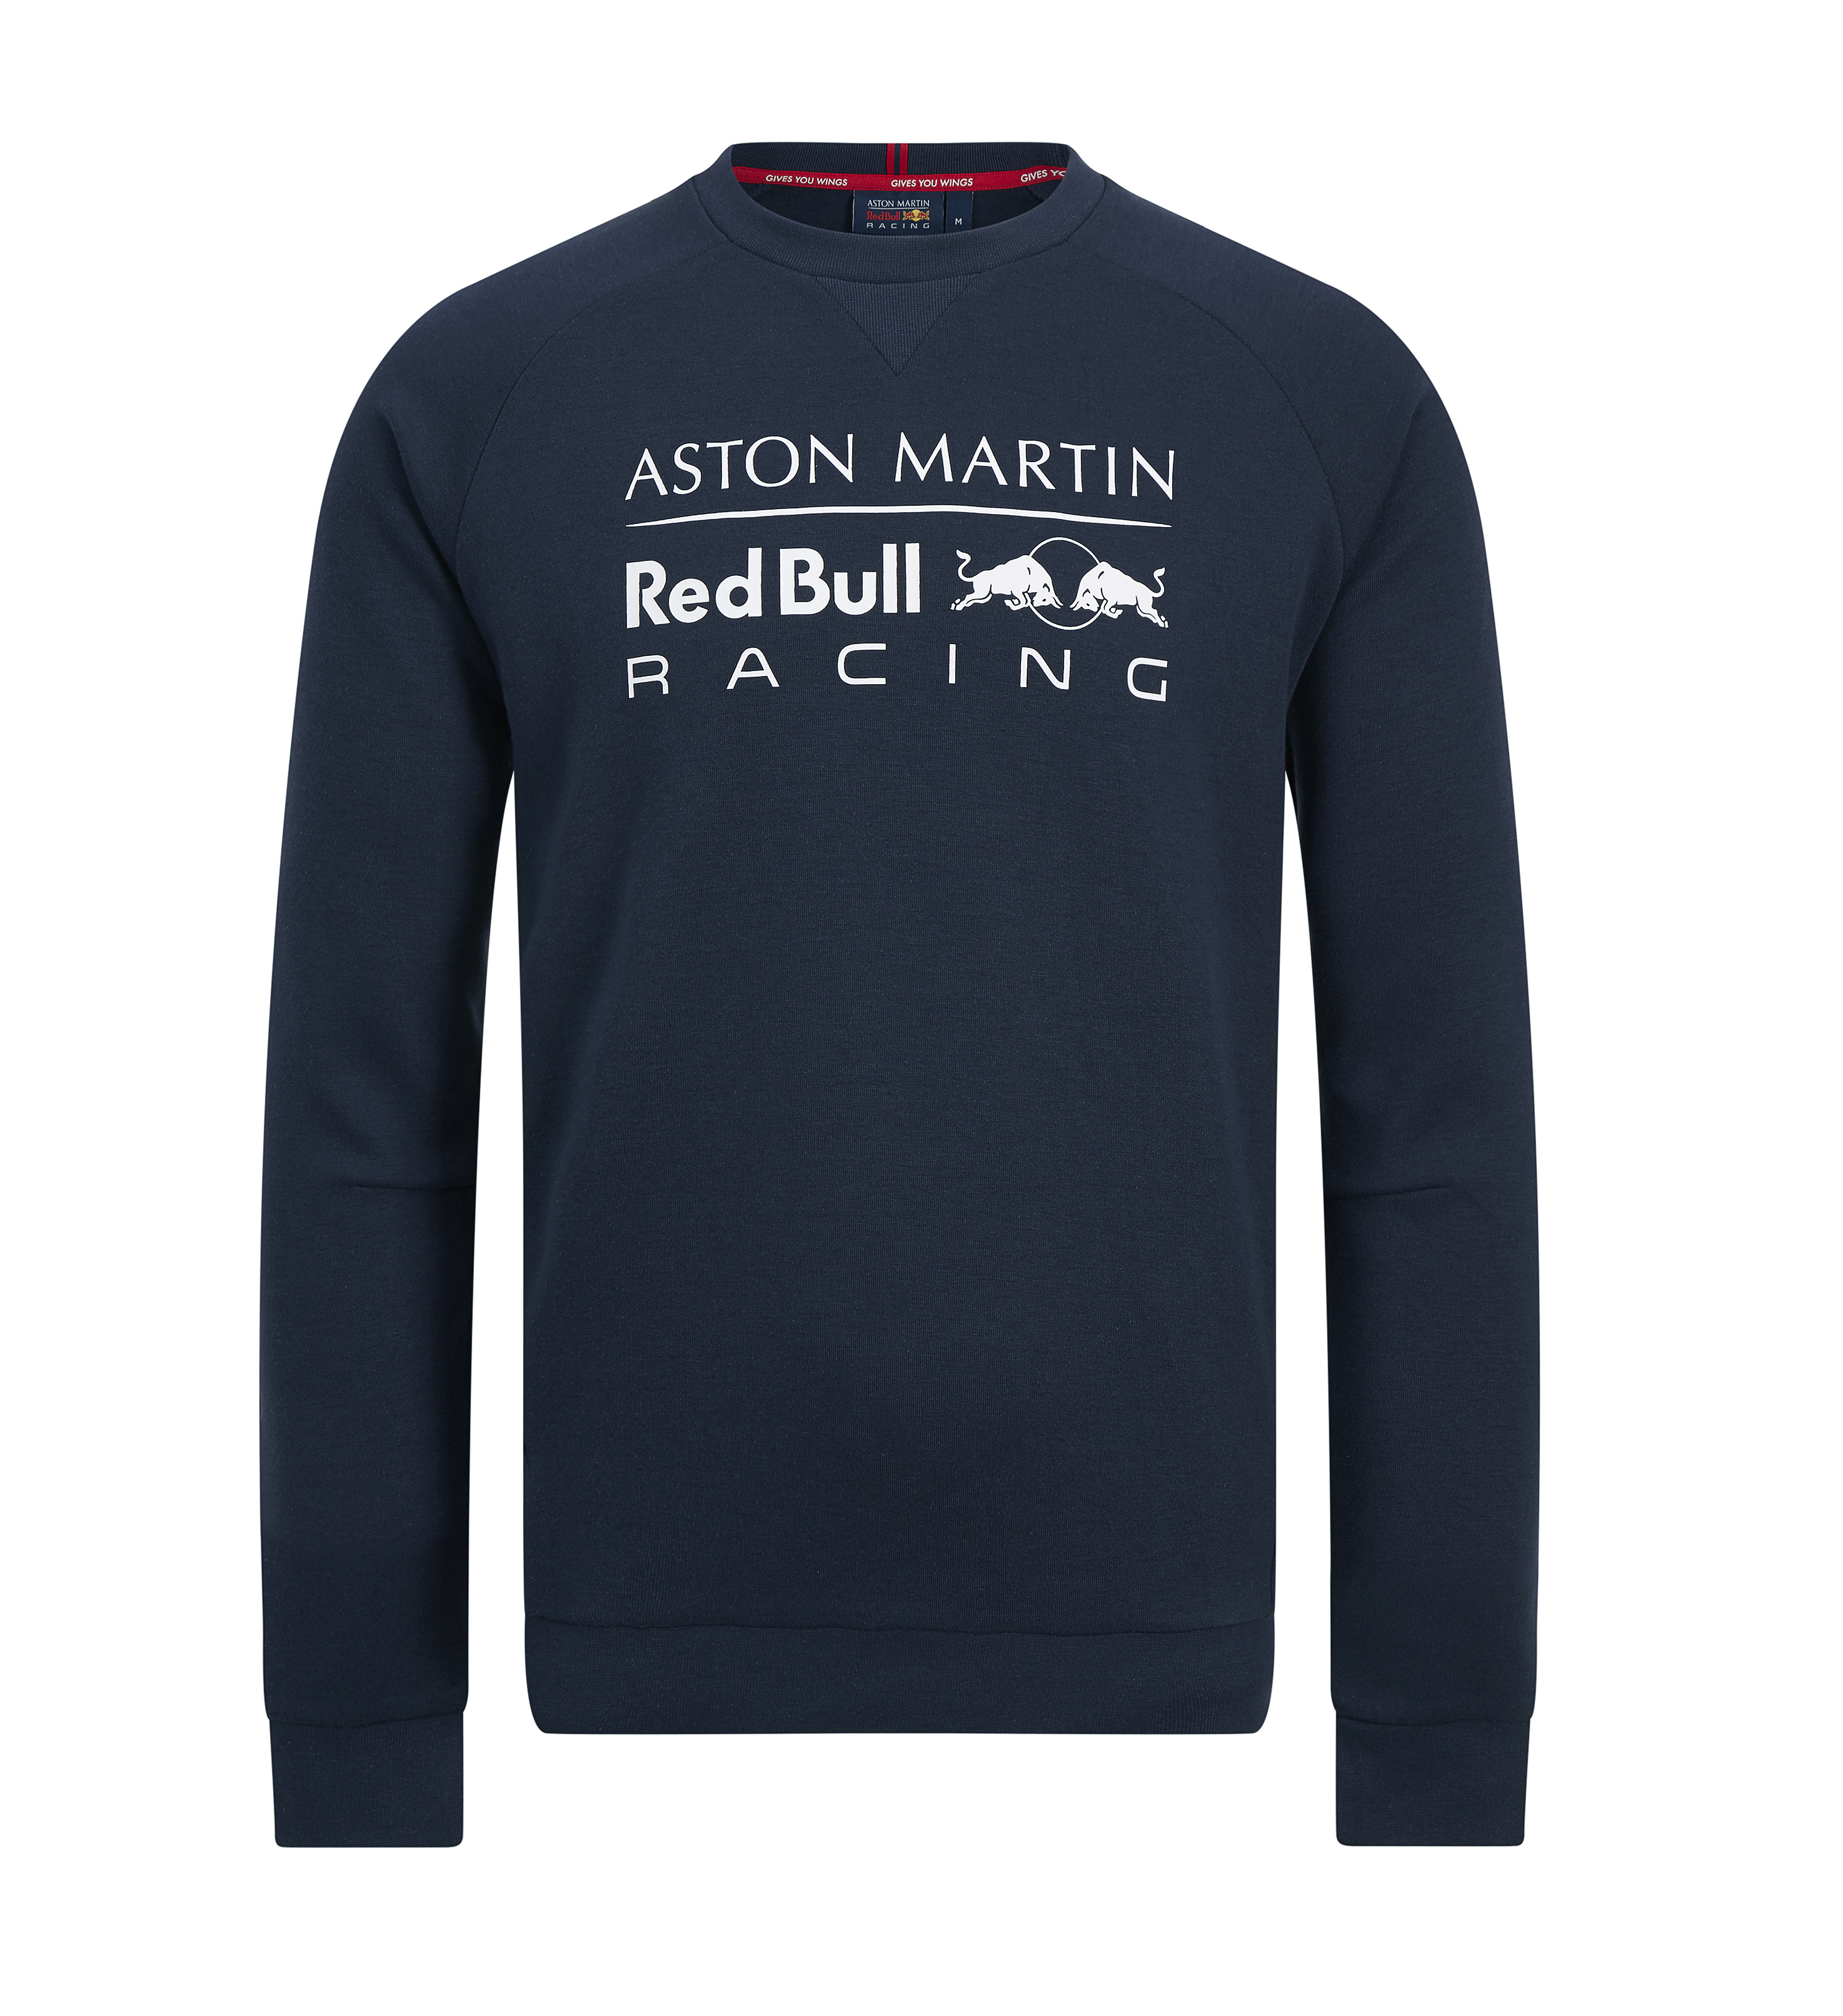 Nuevo 2019 Aston Martin Red Bull Racing F1 Para Hombre Cuello Redondo Sudadera Jumper Top Ebay